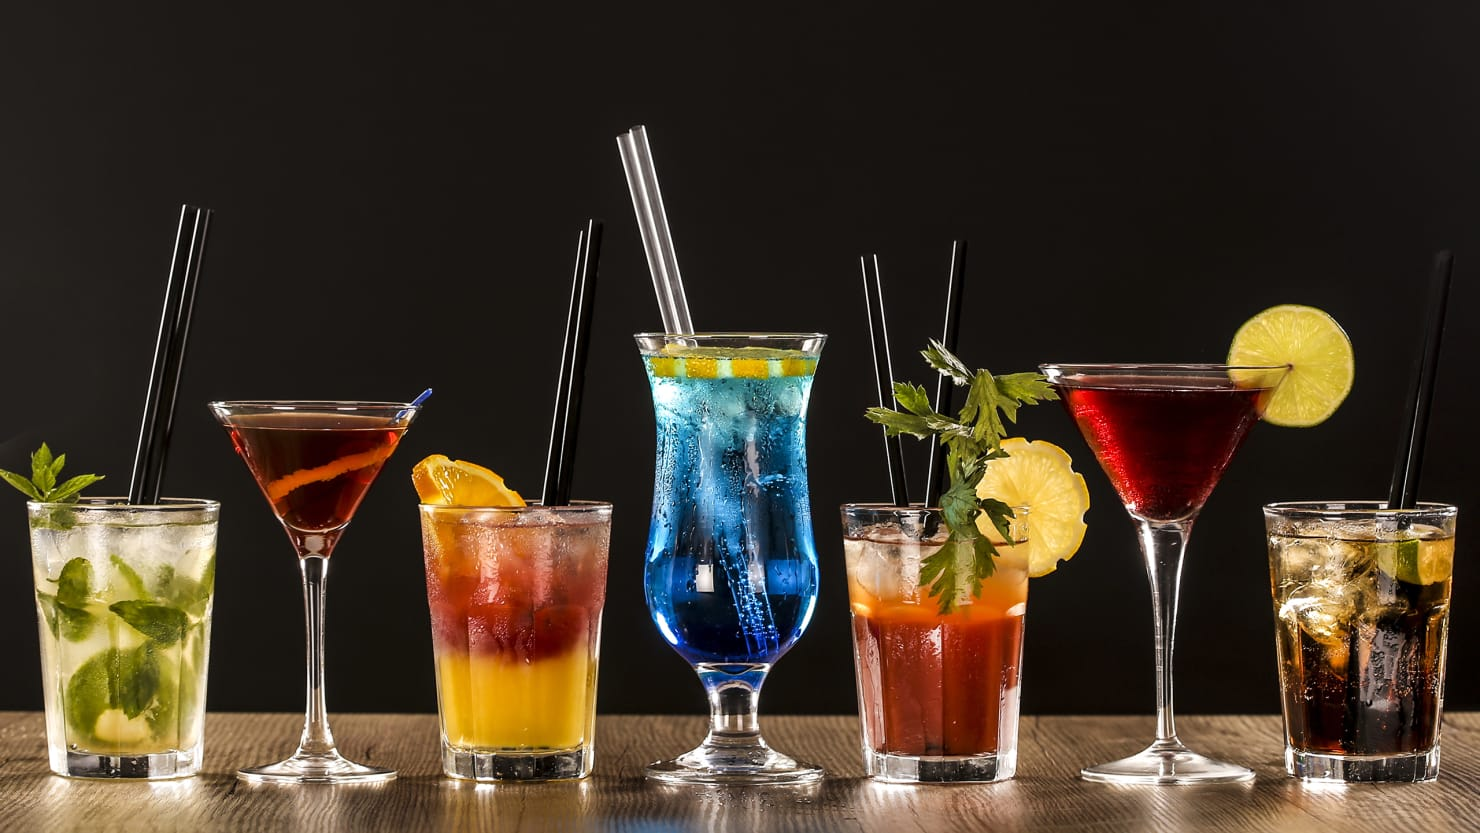 180131-wondrich-bad-cocktail-tease_wghhv8